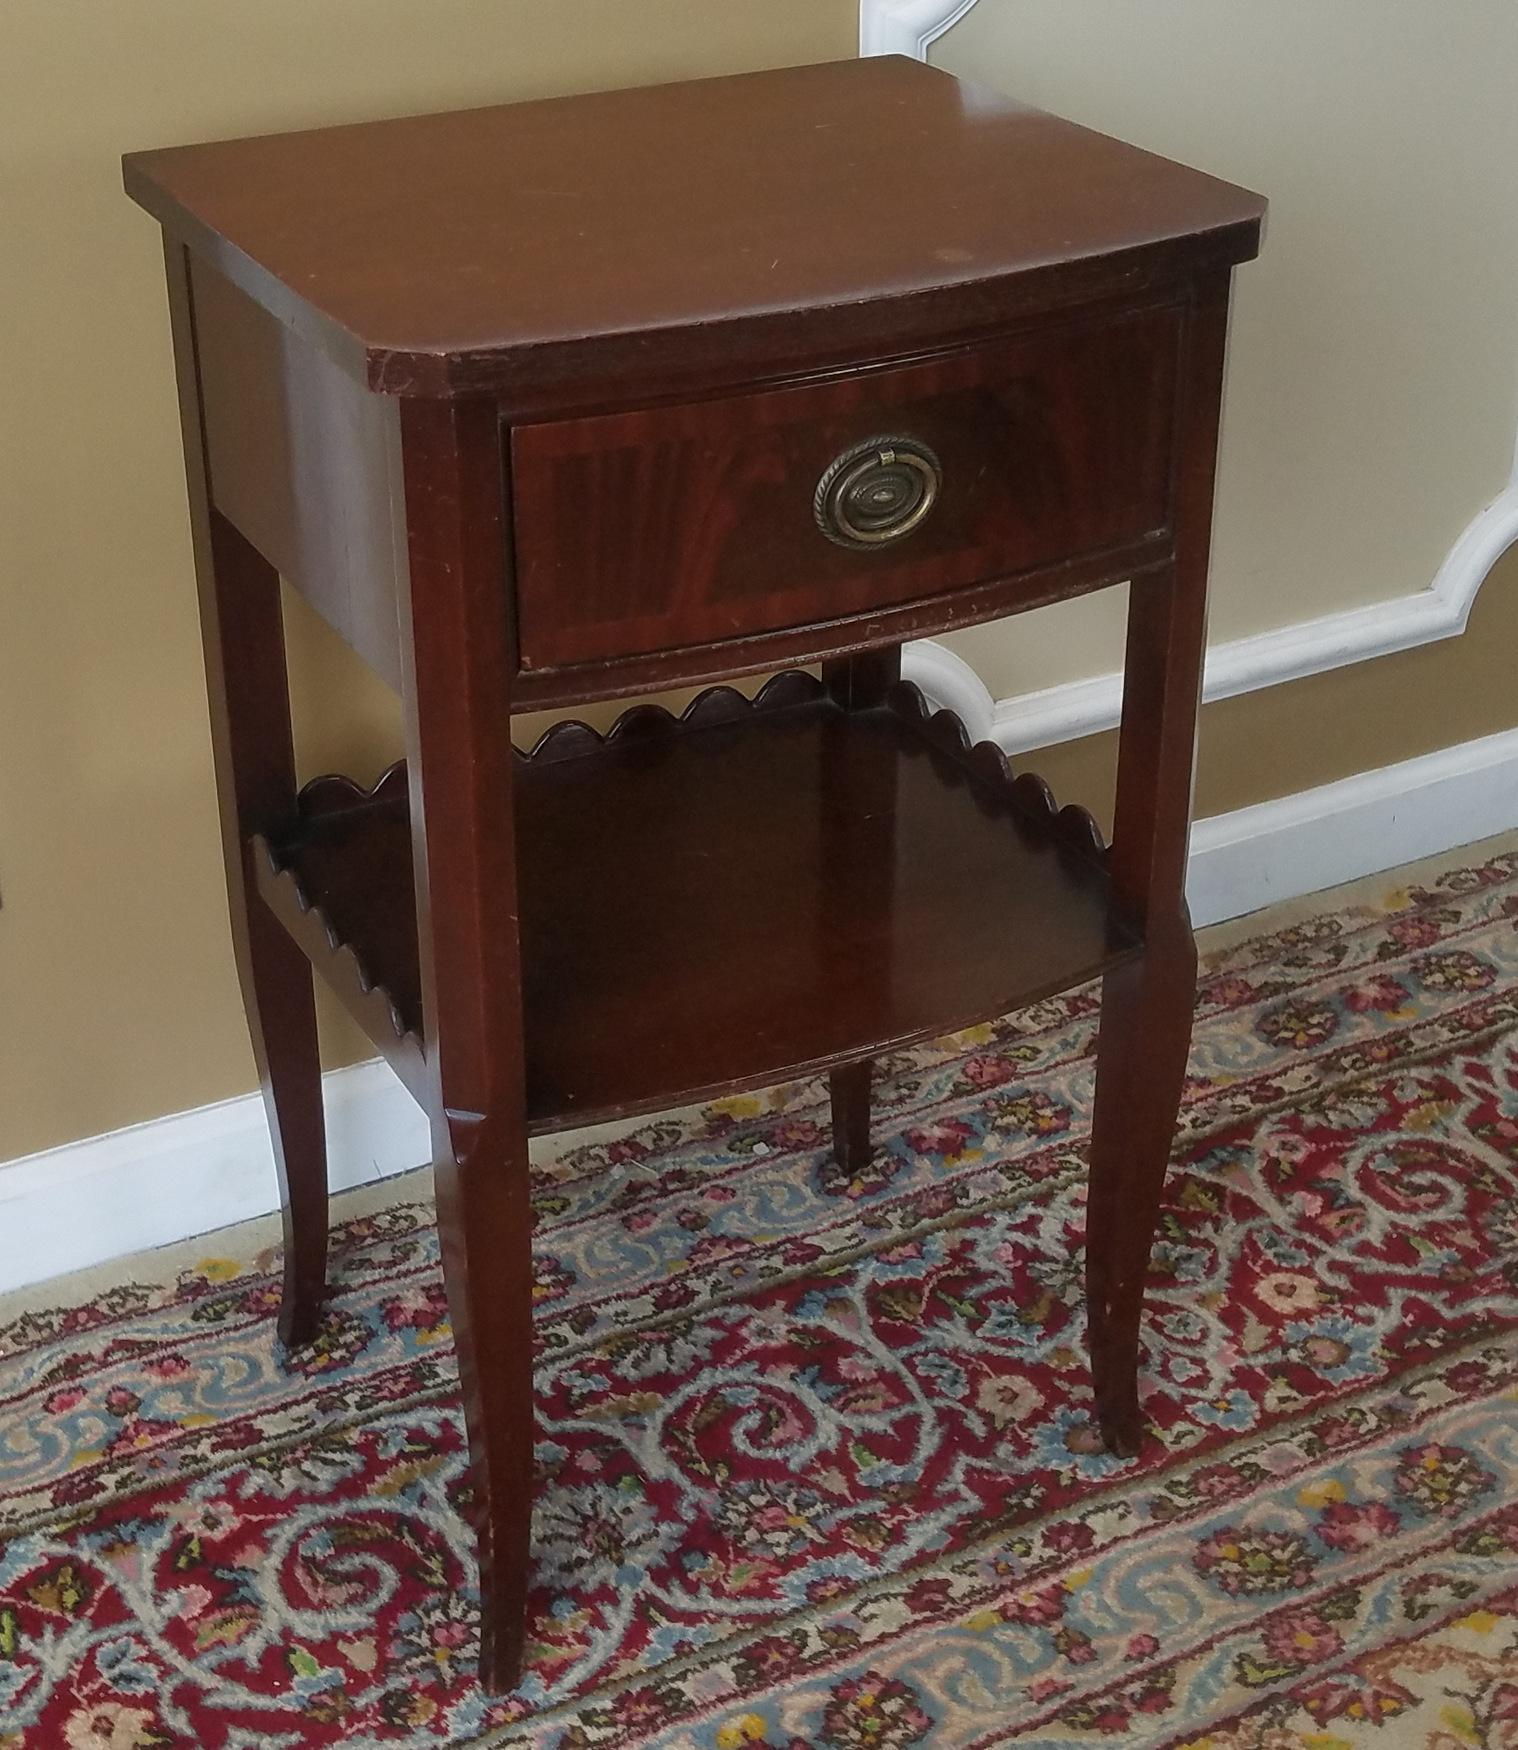 Rway Northern Furniture Co Mahogany Sheraton Style Bedroom Nightstand    Image 2 Of 8